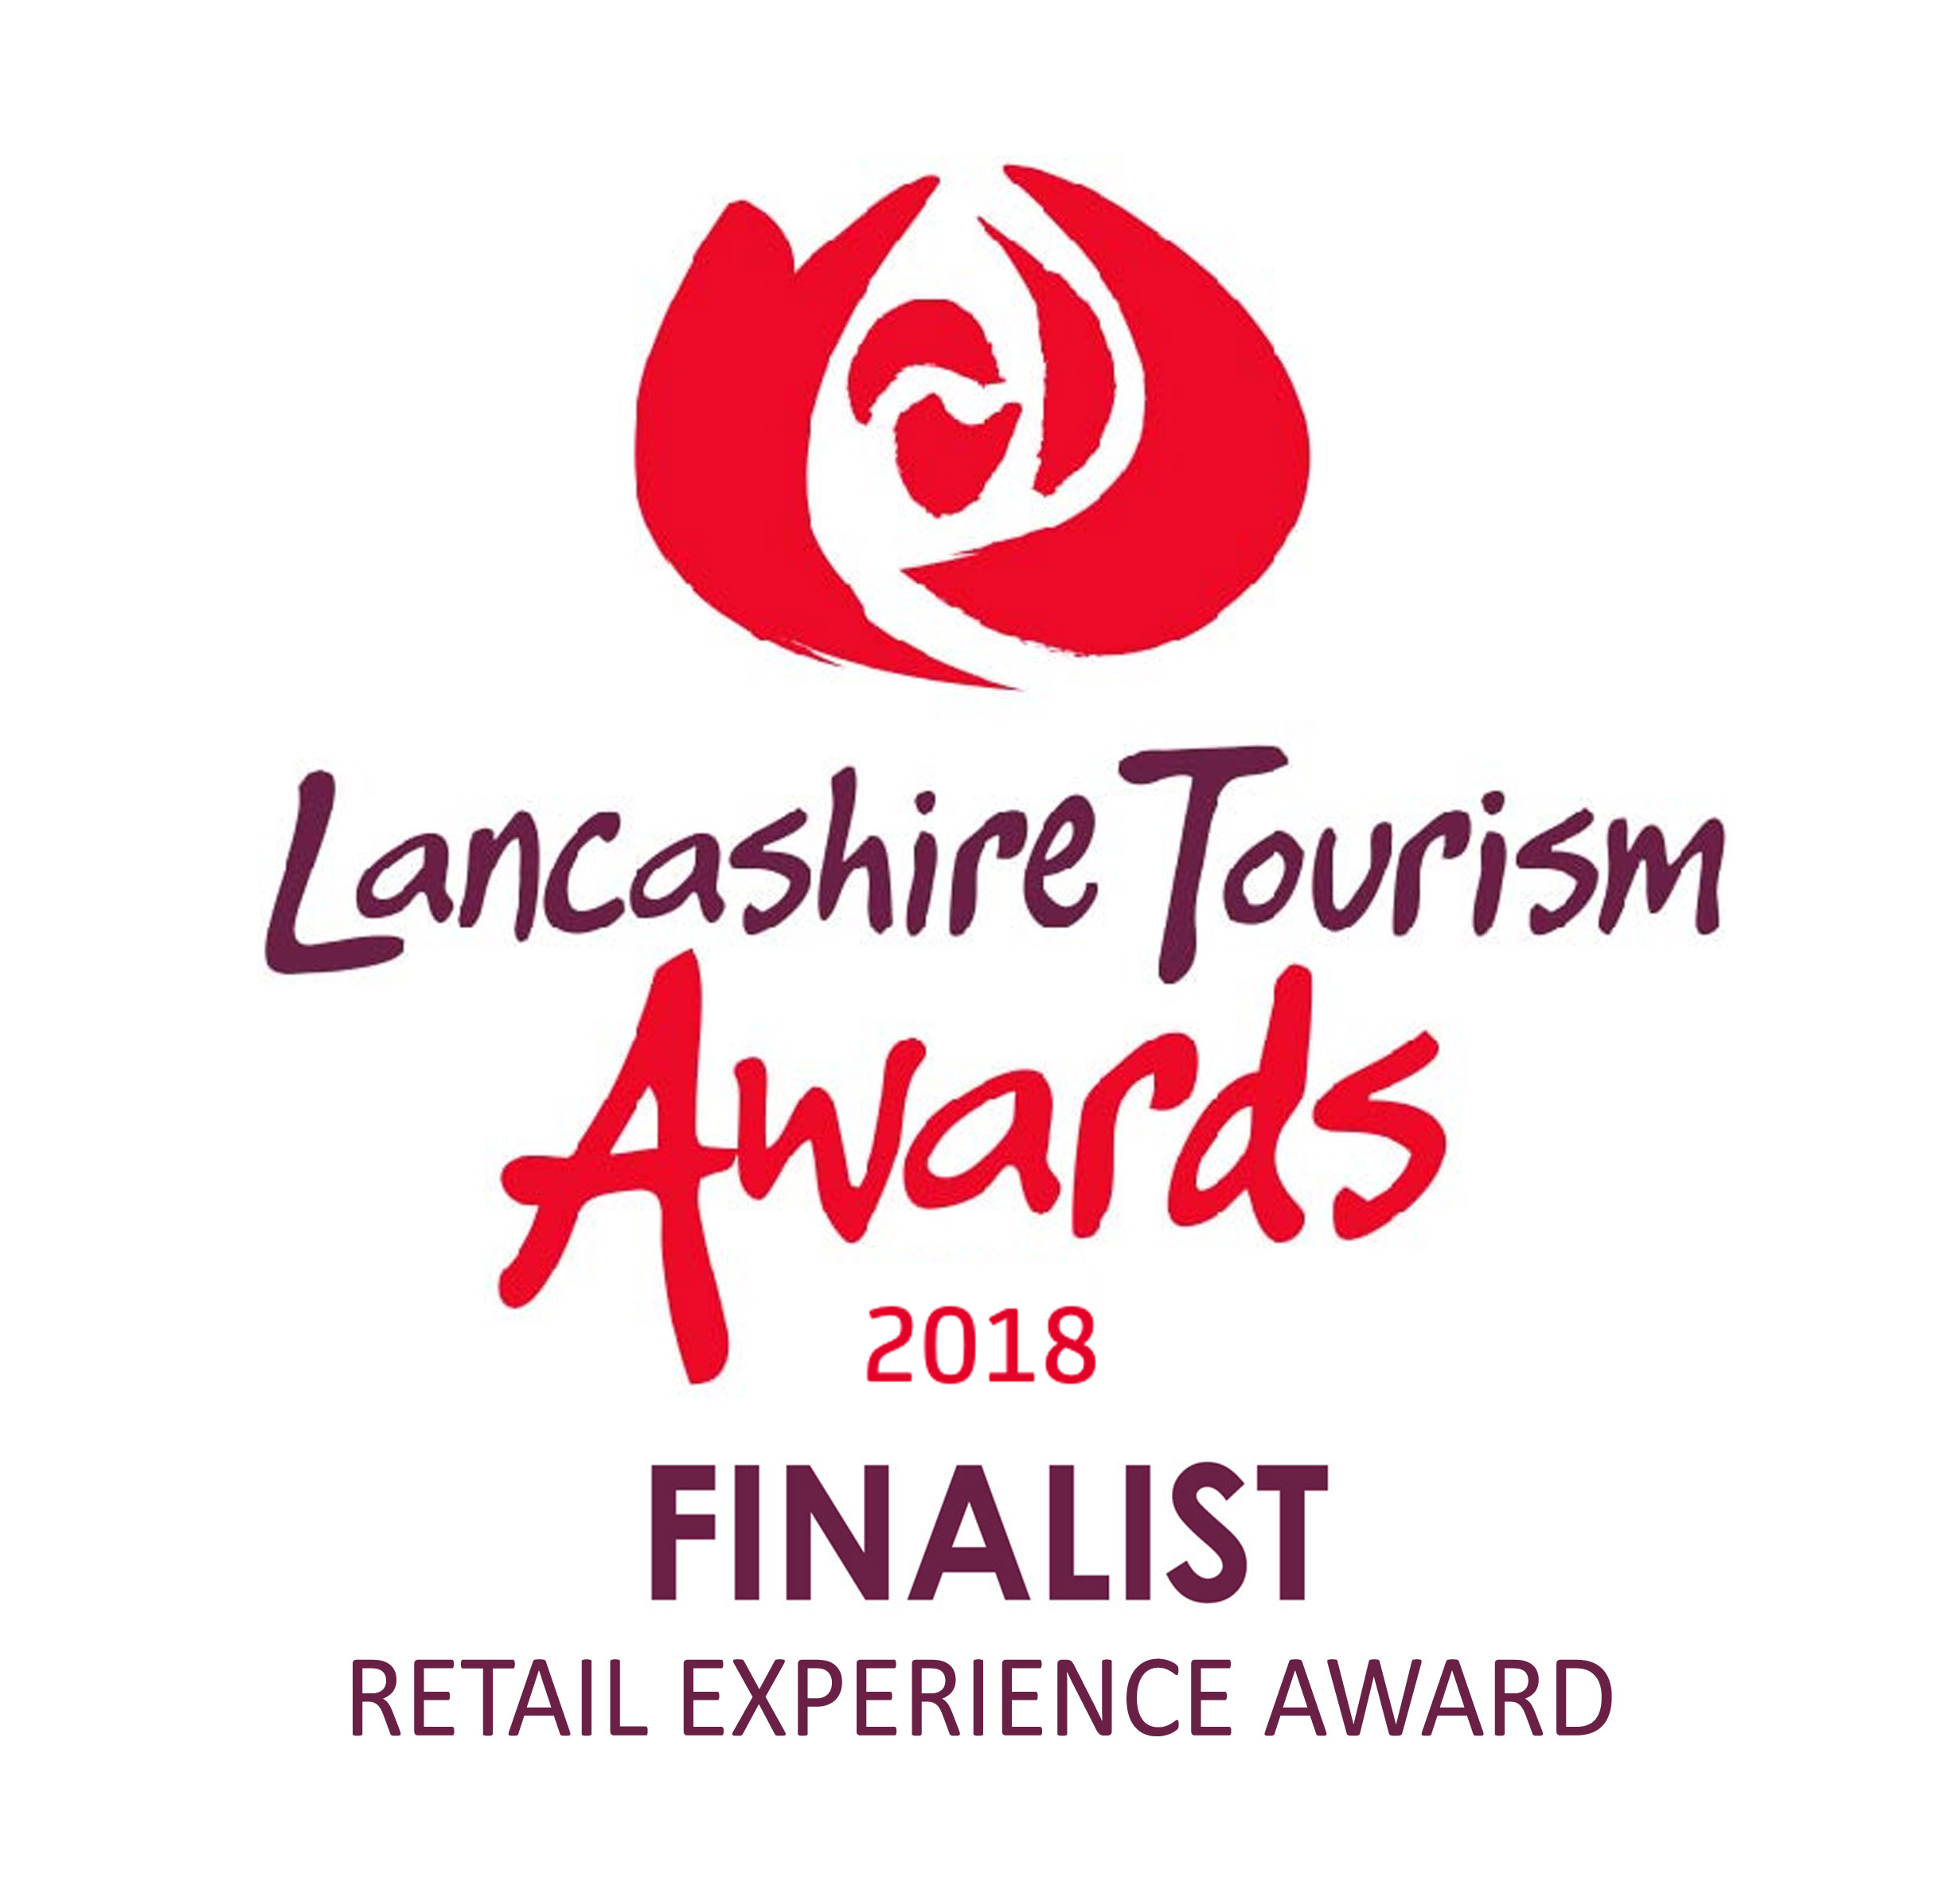 lancashire-tourism-awards-2018-finalist-logo-retail-experience-award.jpg